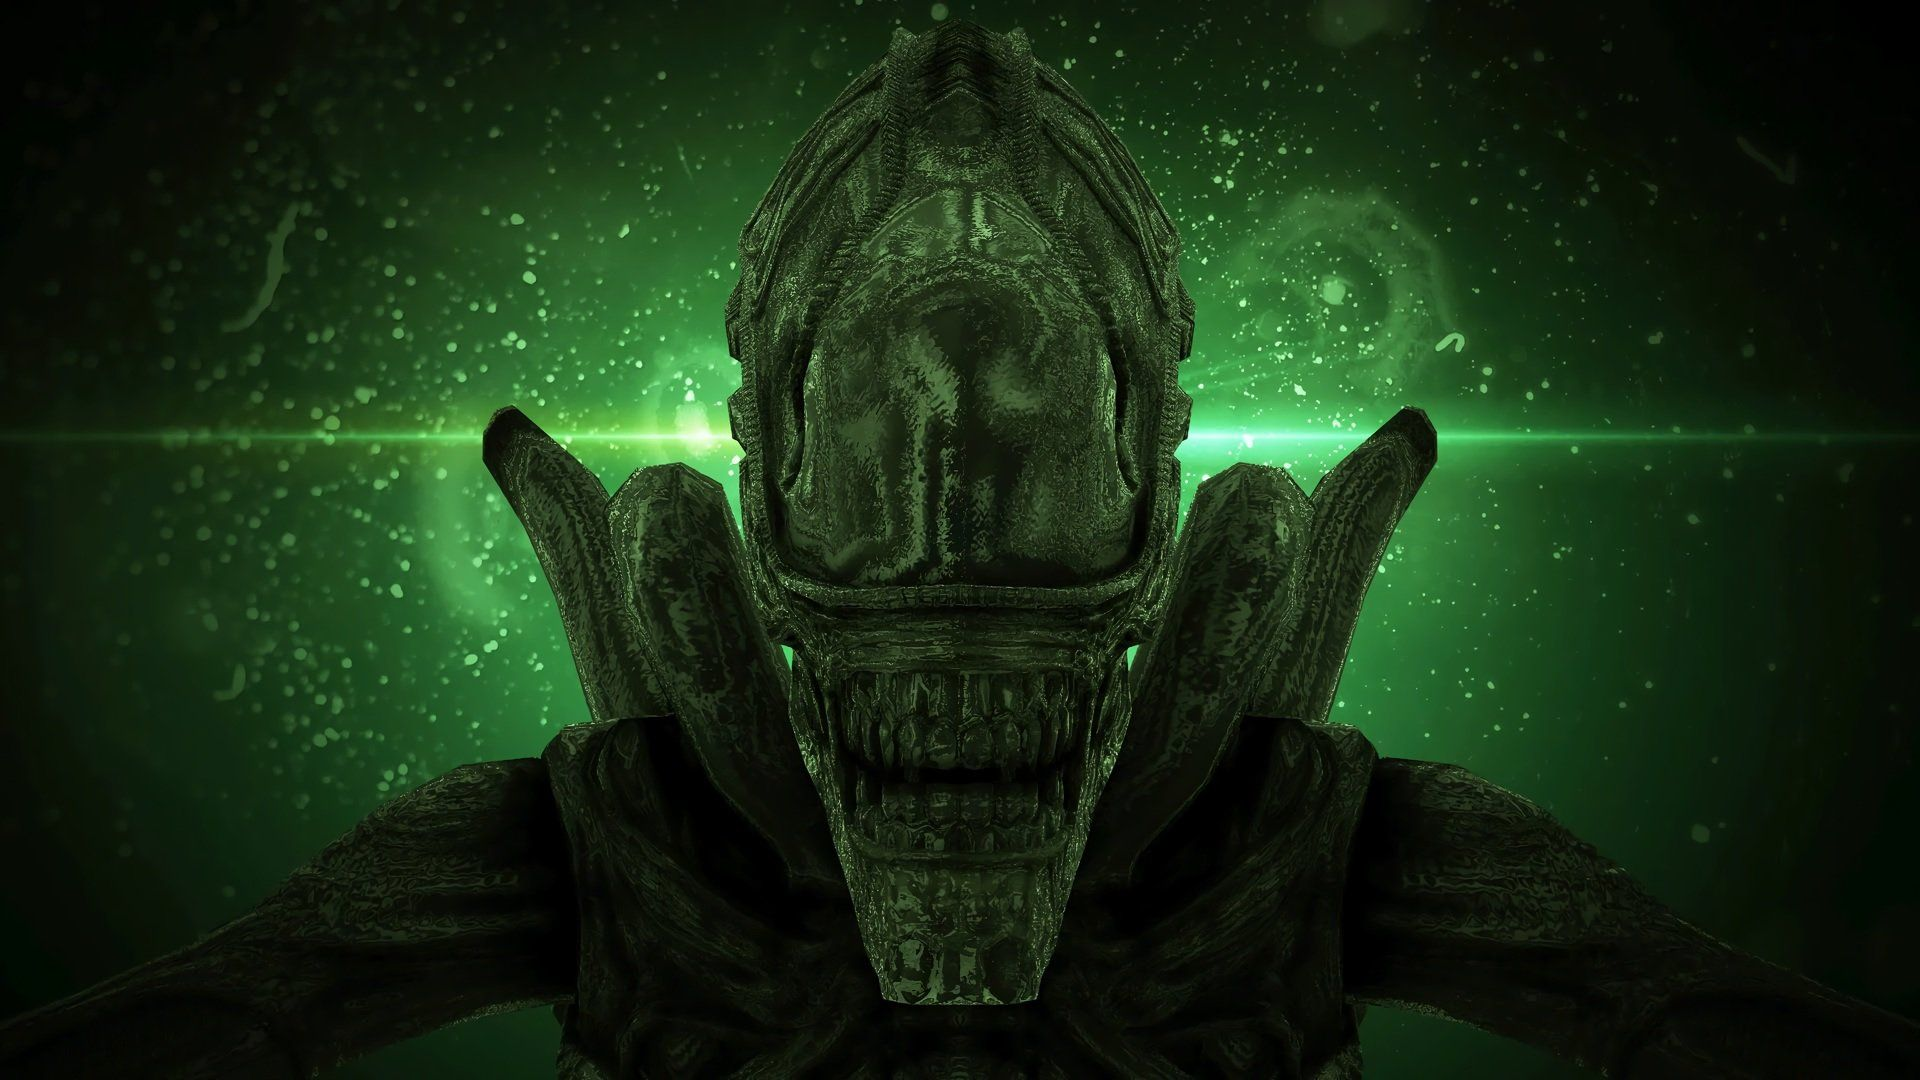 Alien covenant full movie online free hd streaming